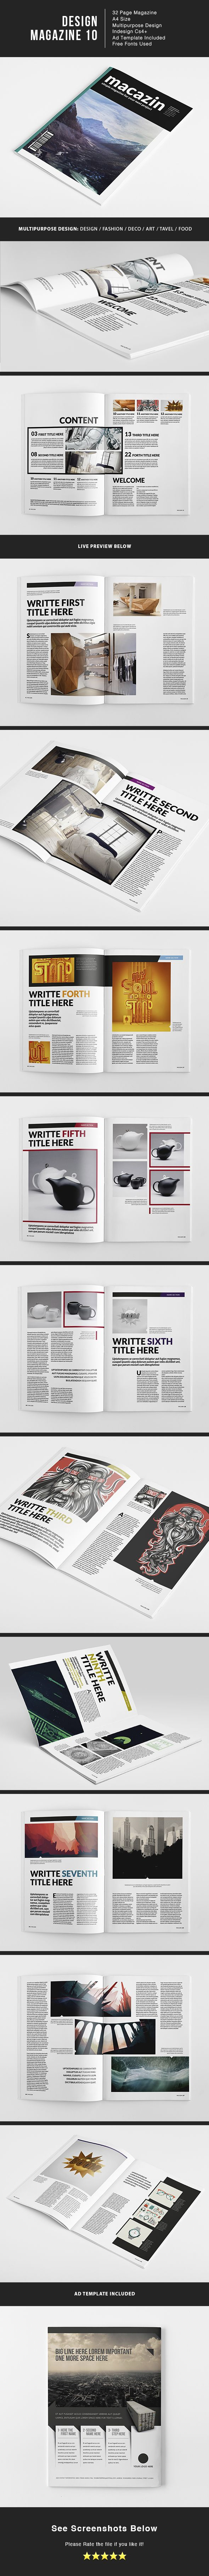 Design MGZ 10 by Lucas Iacono, via Behance